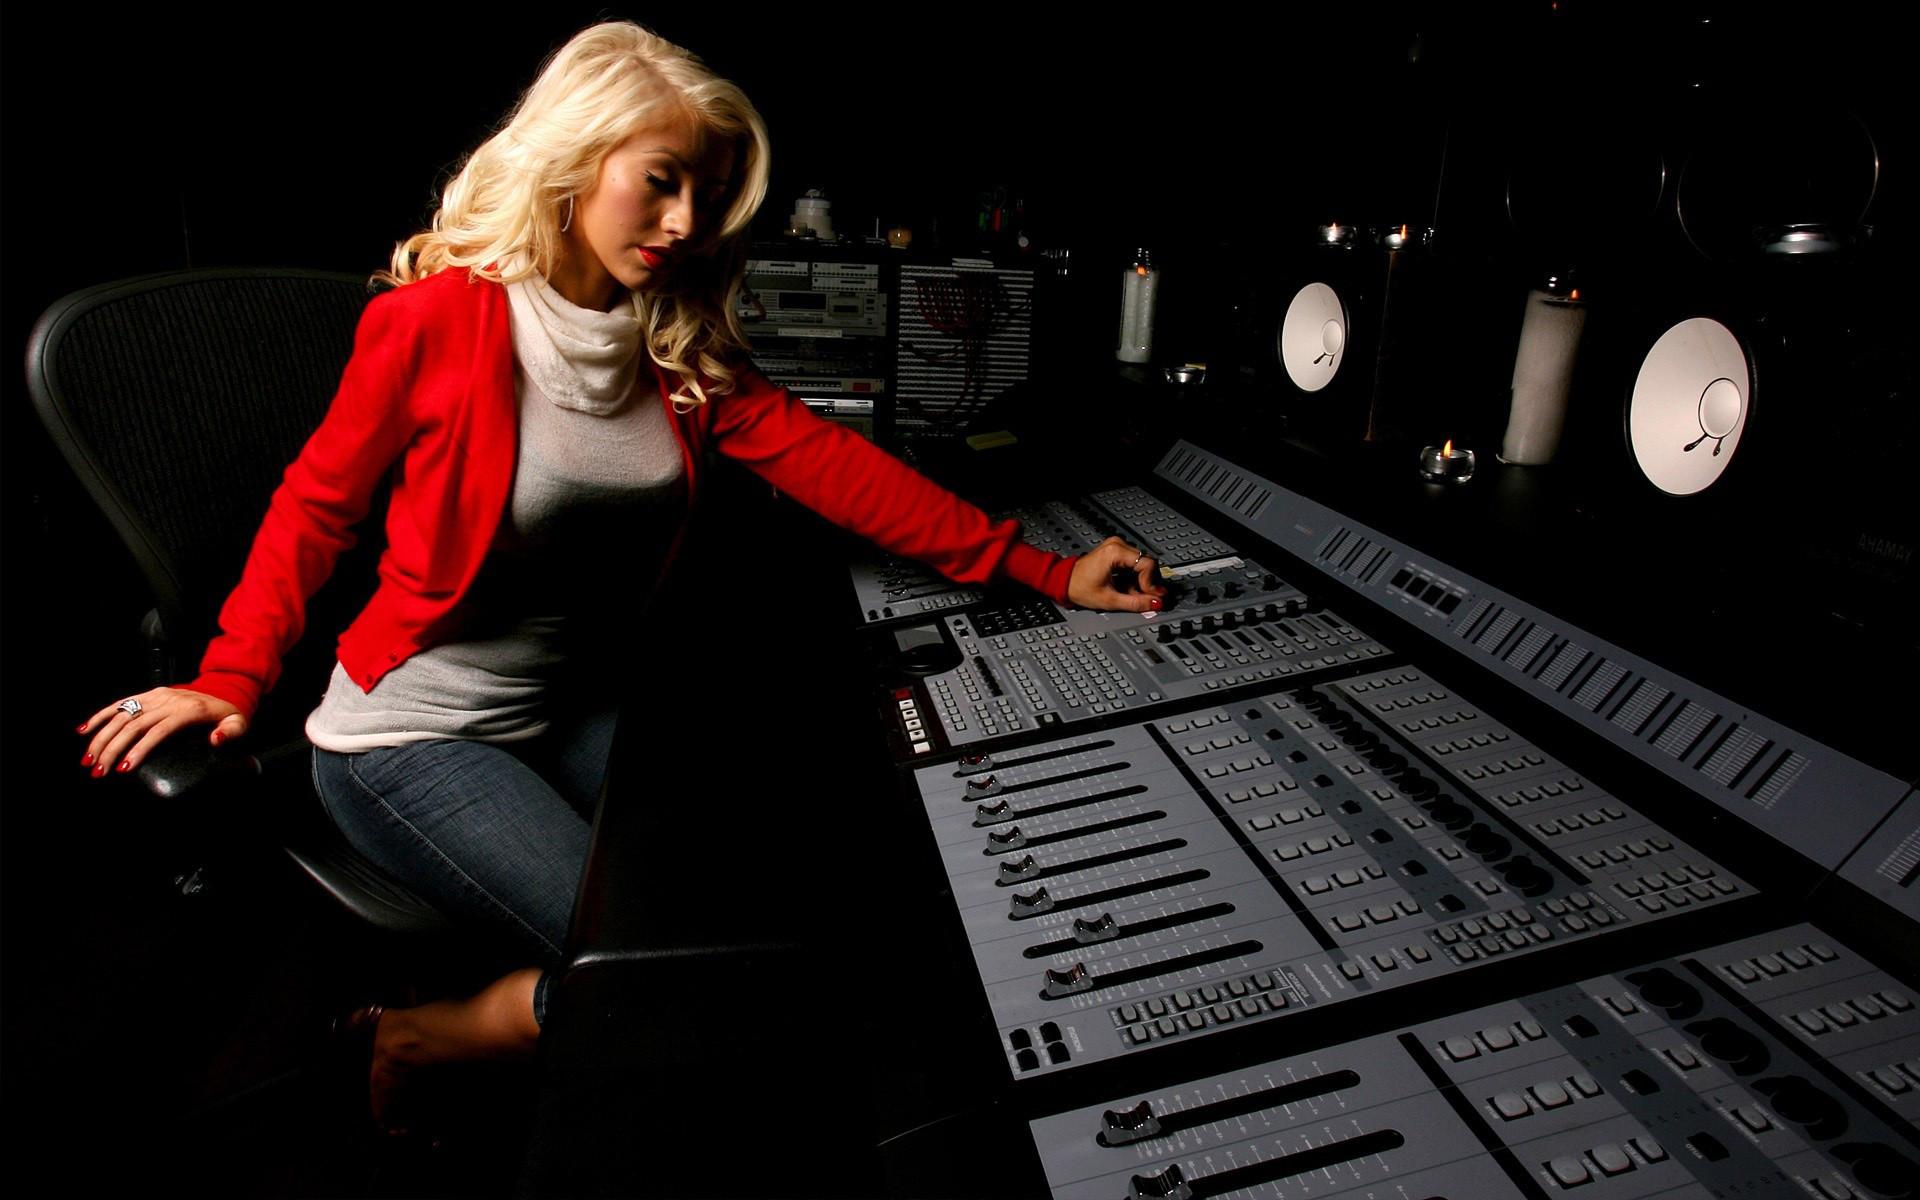 hd wallpaper recording studio – photo #42. Christina Aguilera wallpaper –  923519